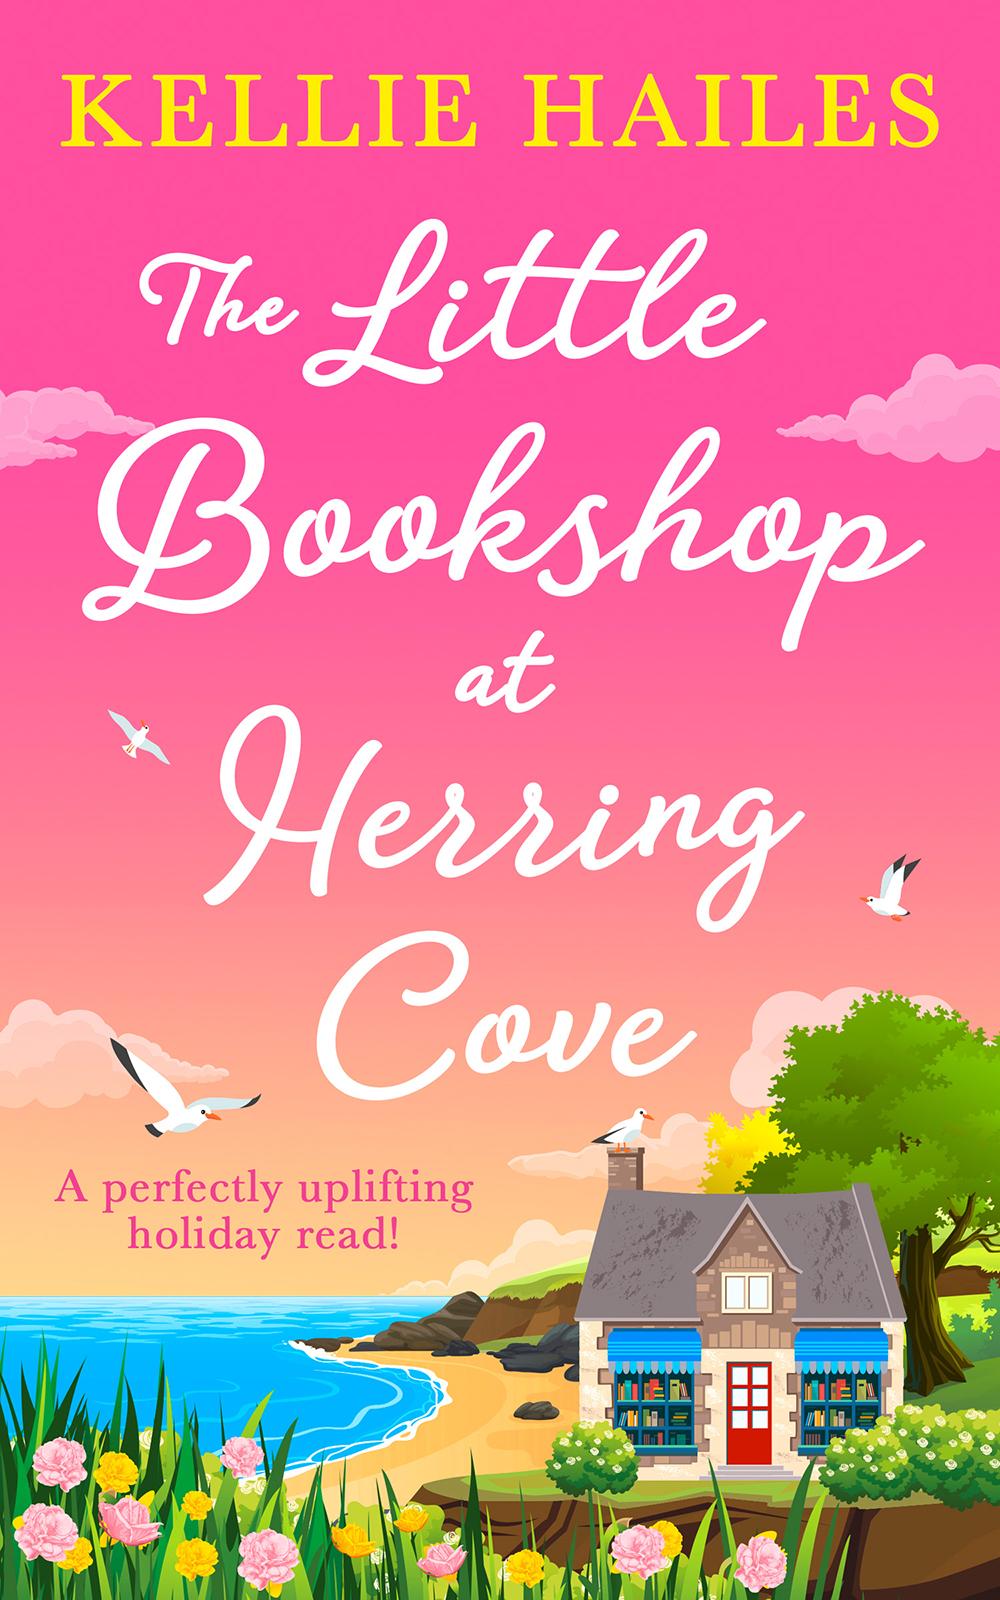 Kellie Hailes The Little Bookshop at Herring Cove